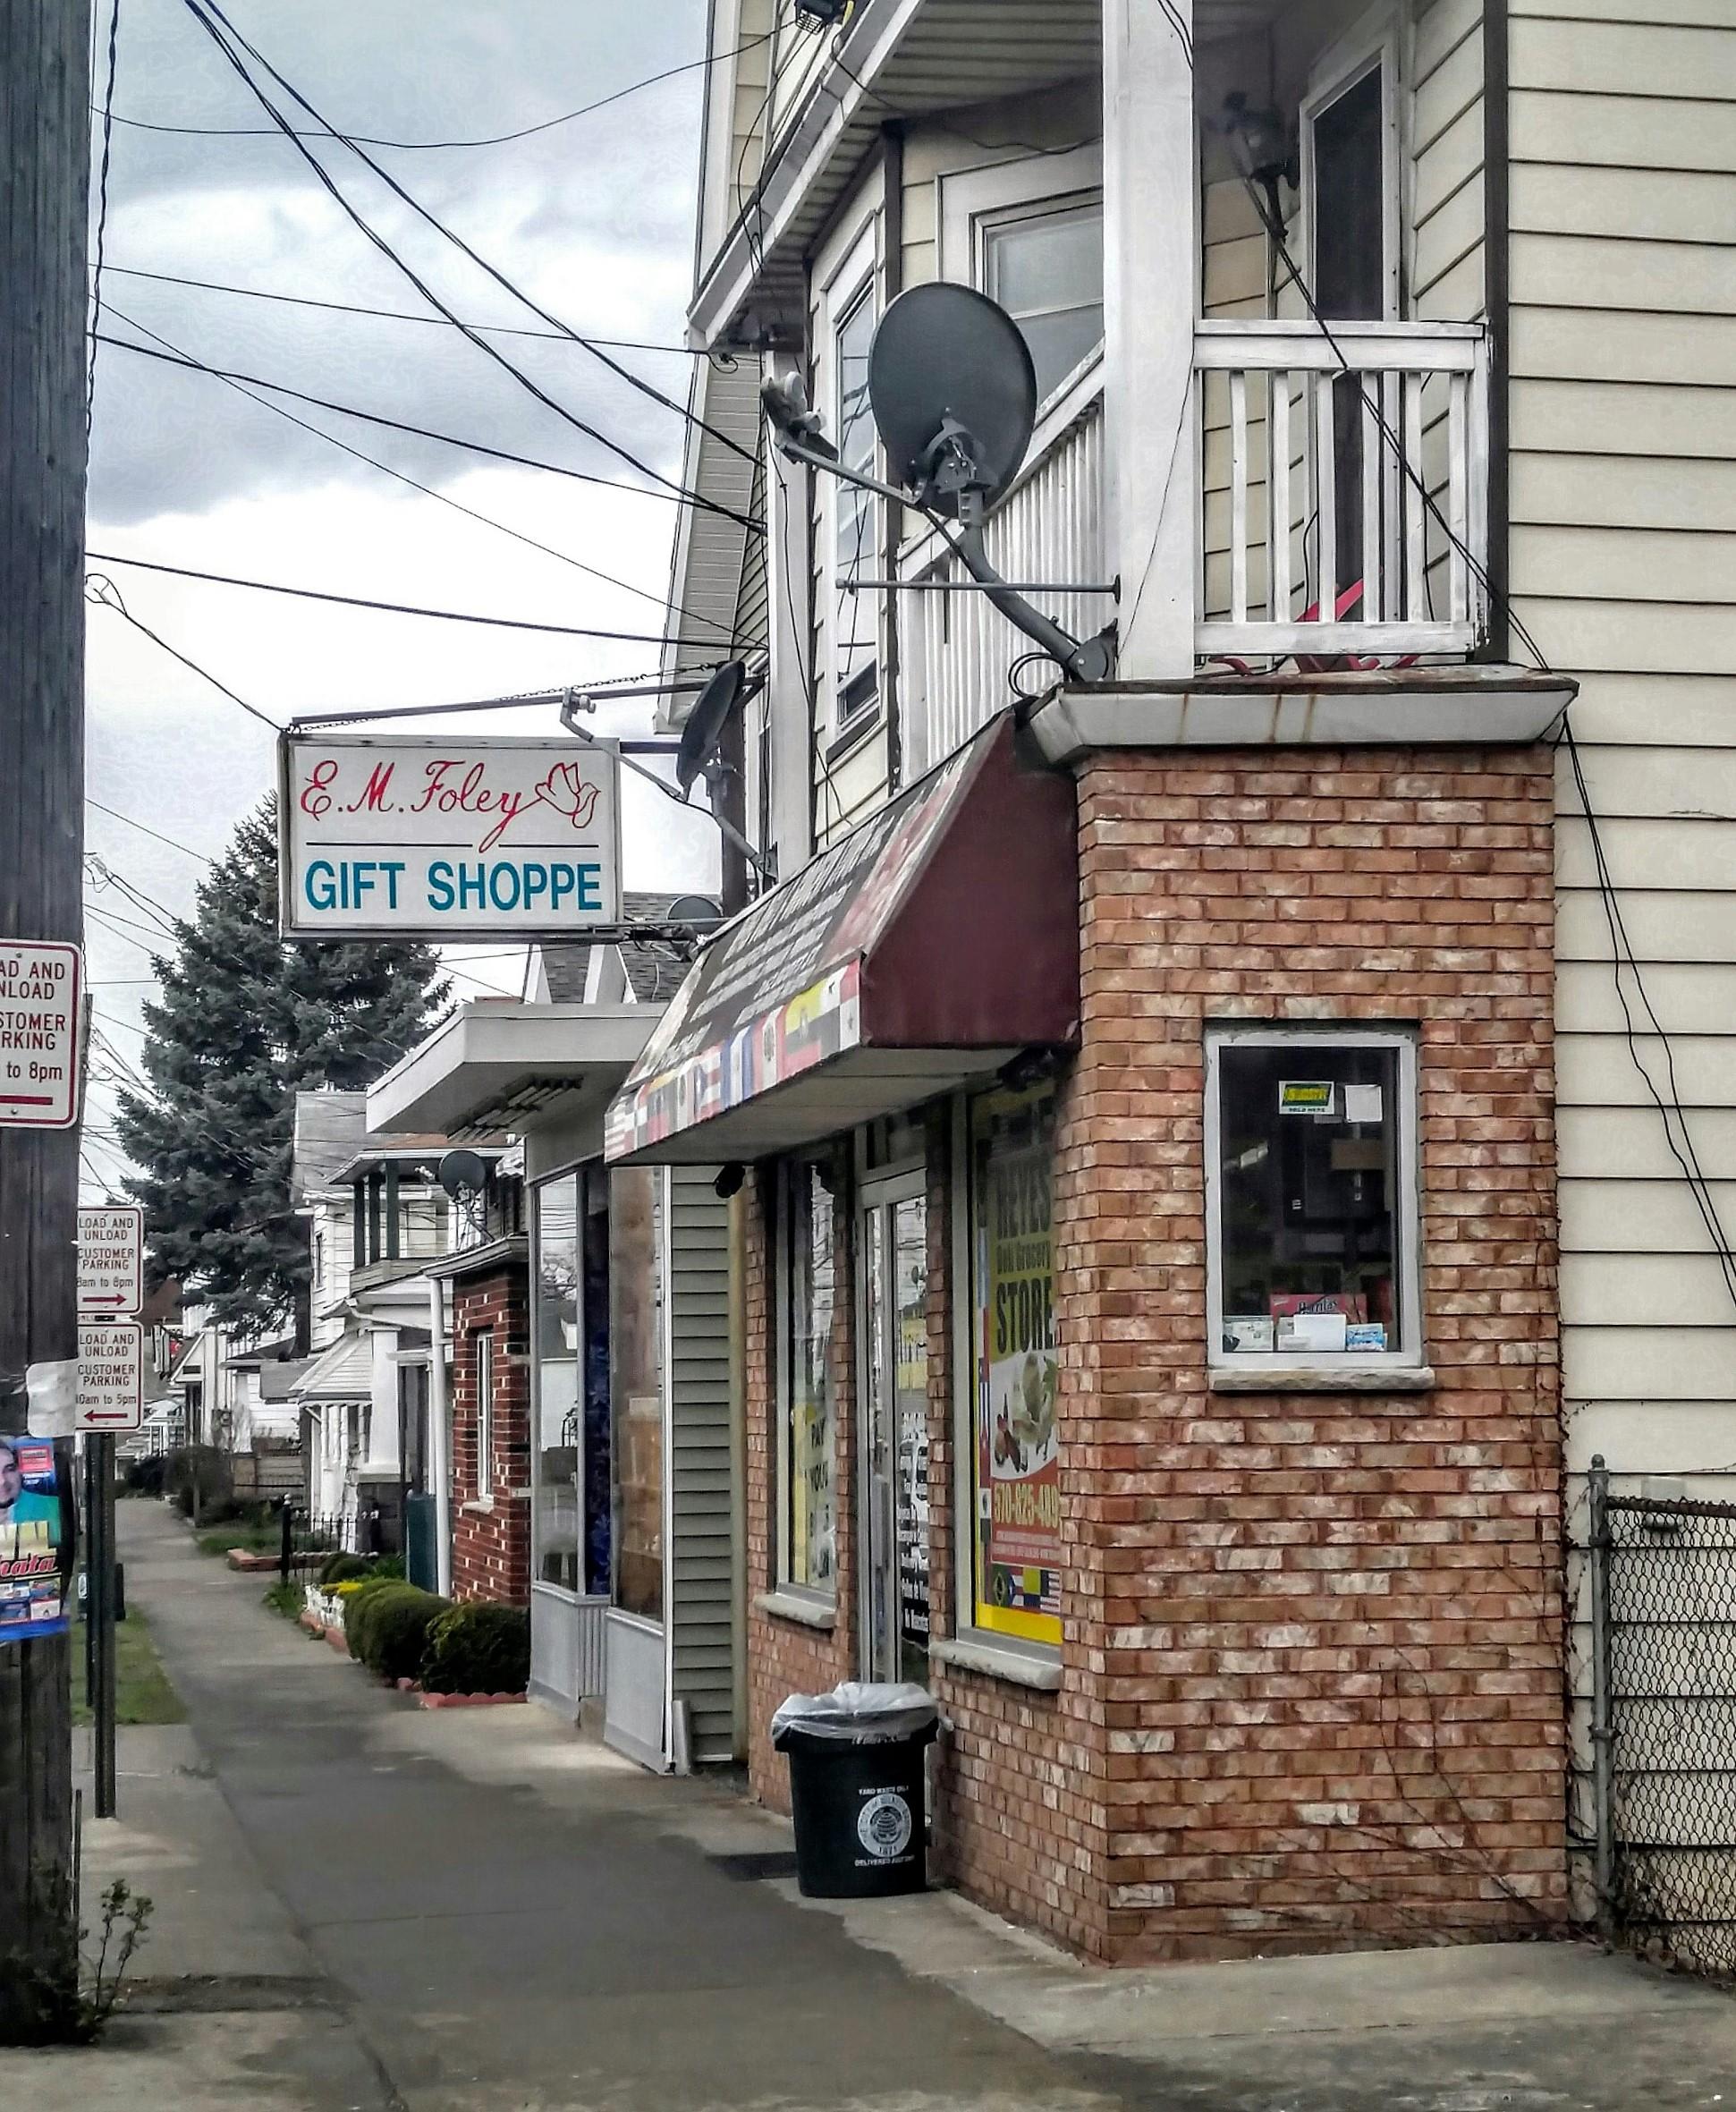 E.M. Foley Gift Shoppe on Scott Street Photo by Sarah Gyle (April 10, 2016)